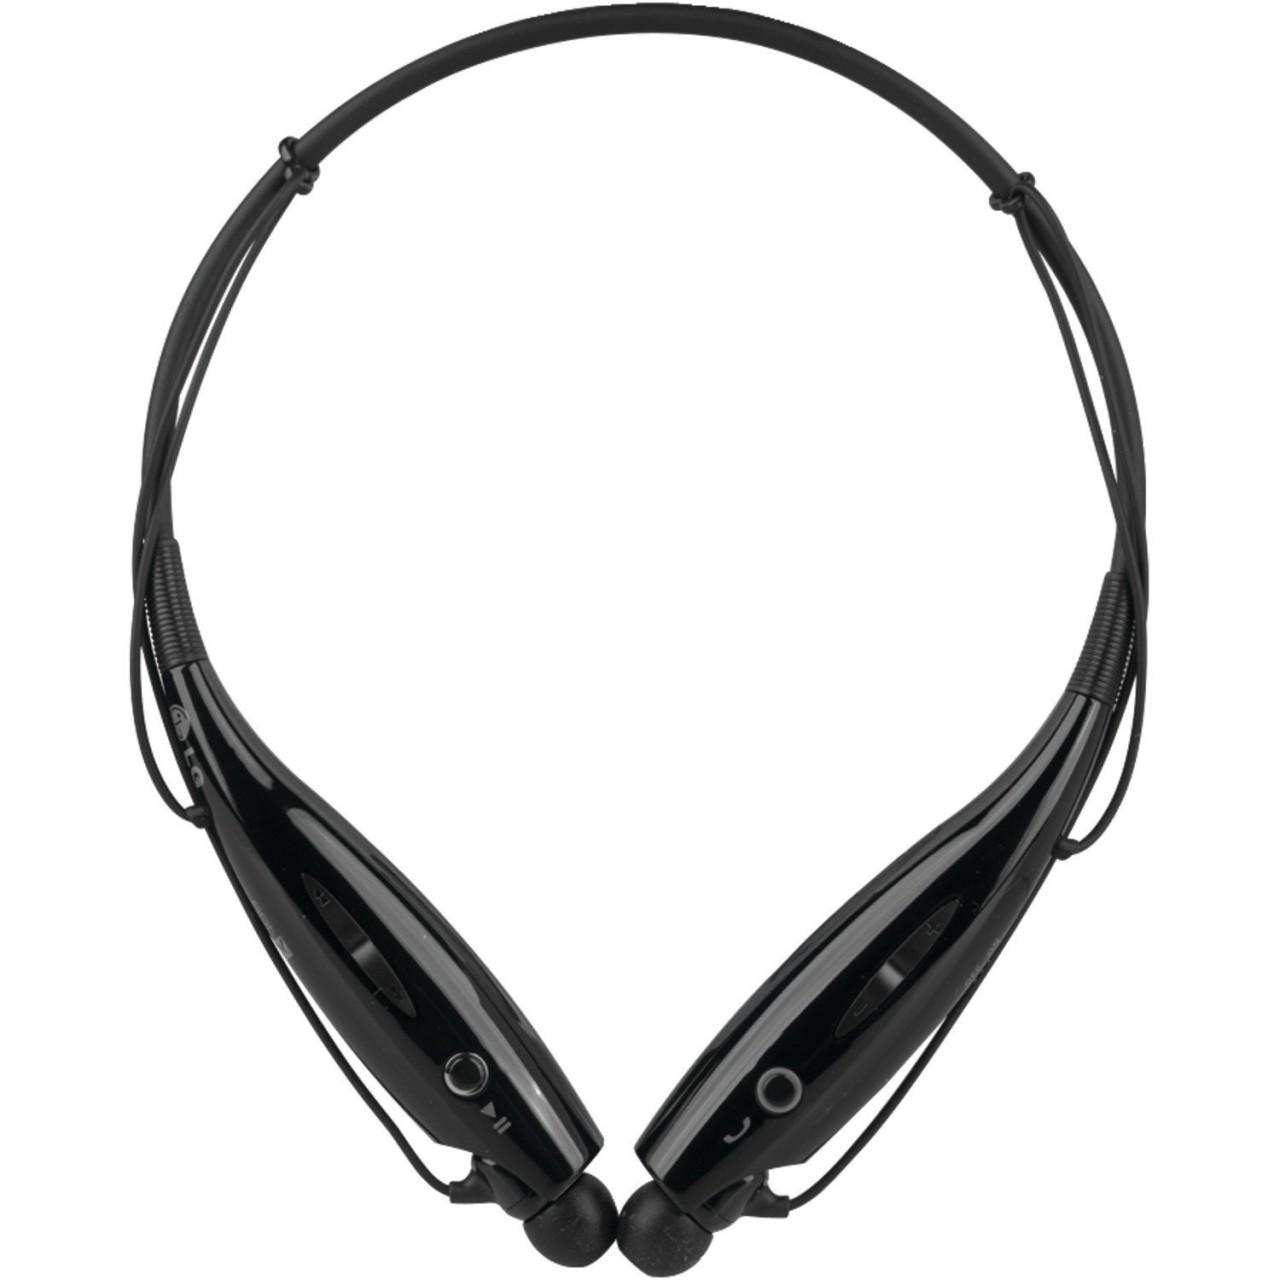 Lg Tone Hbs 730 Bluetooth Handsfree Price In Pakstan